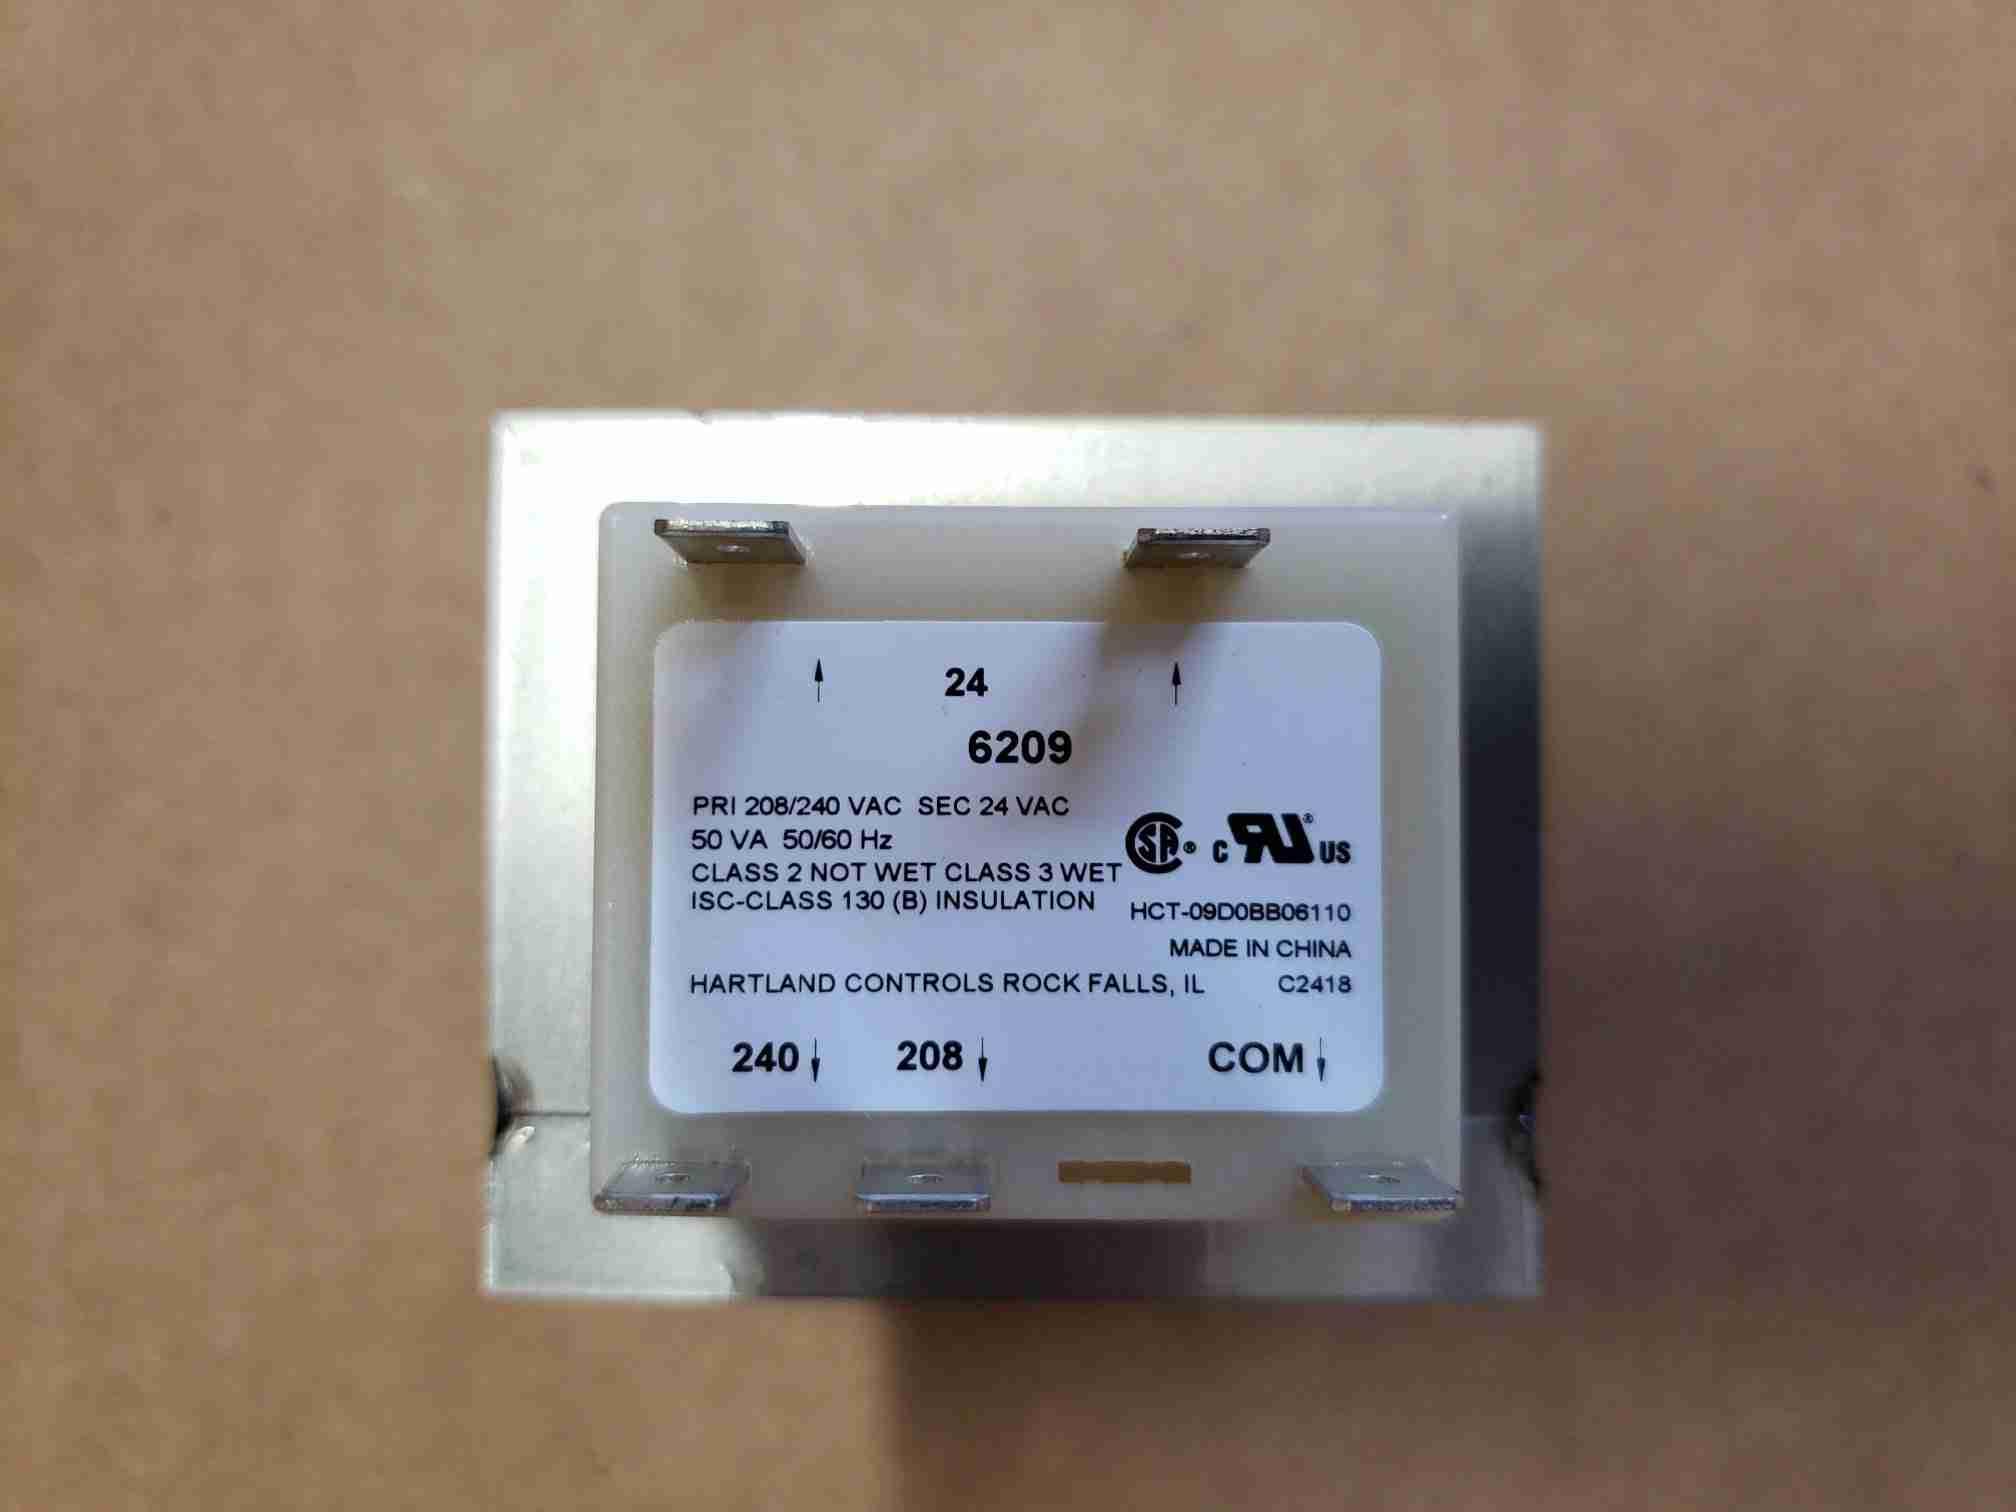 Label view of Transformer for Heat Pump Display Retrofit Kit